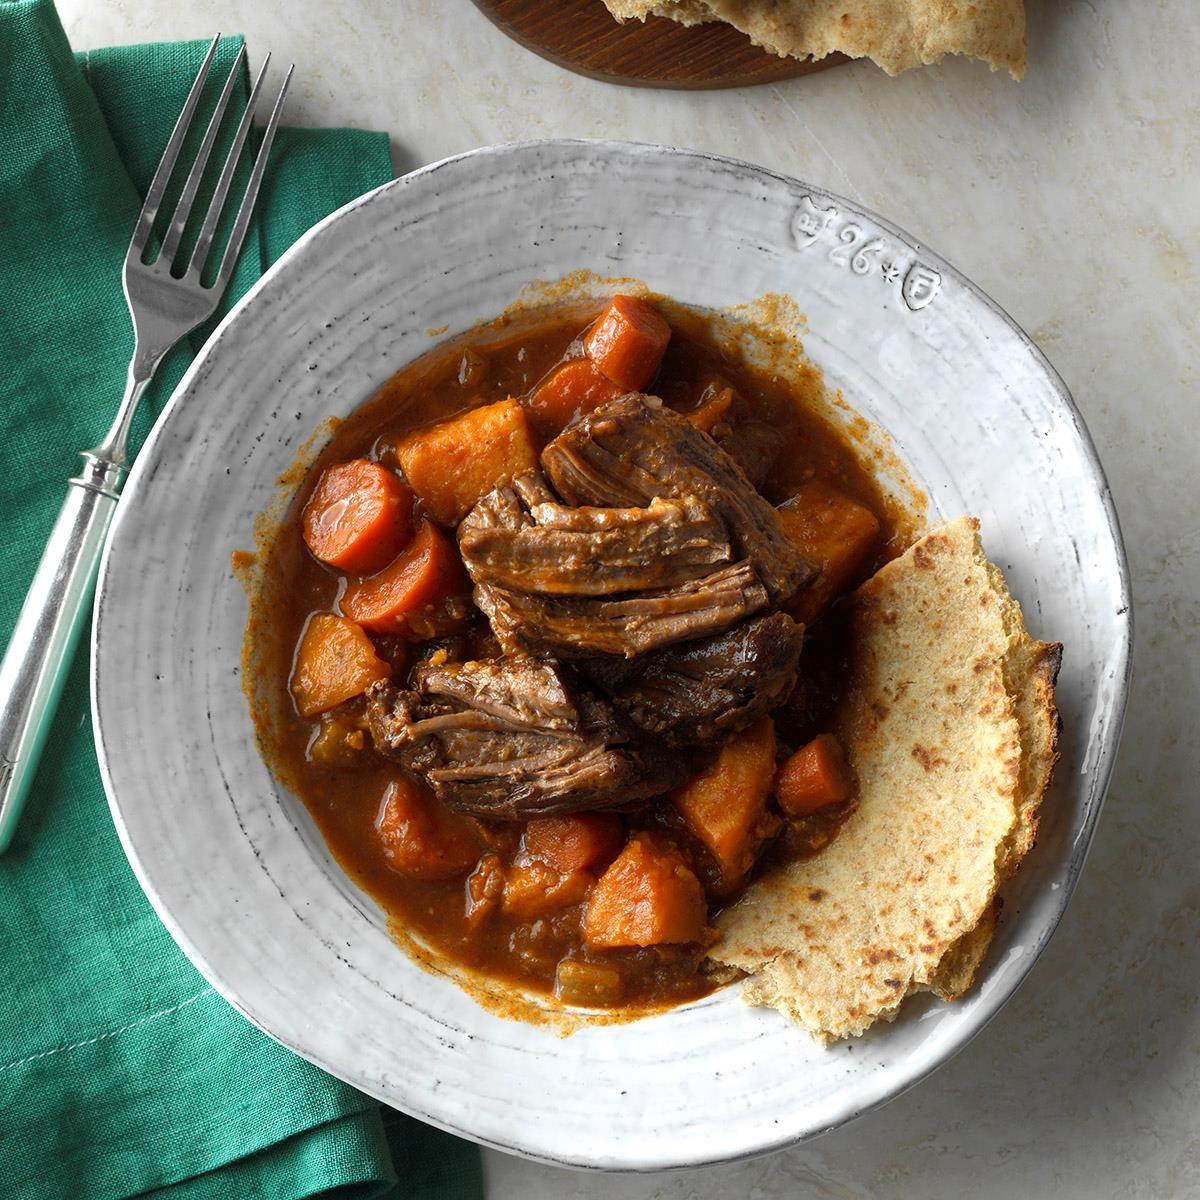 Day 18: Caribbean Pot Roast